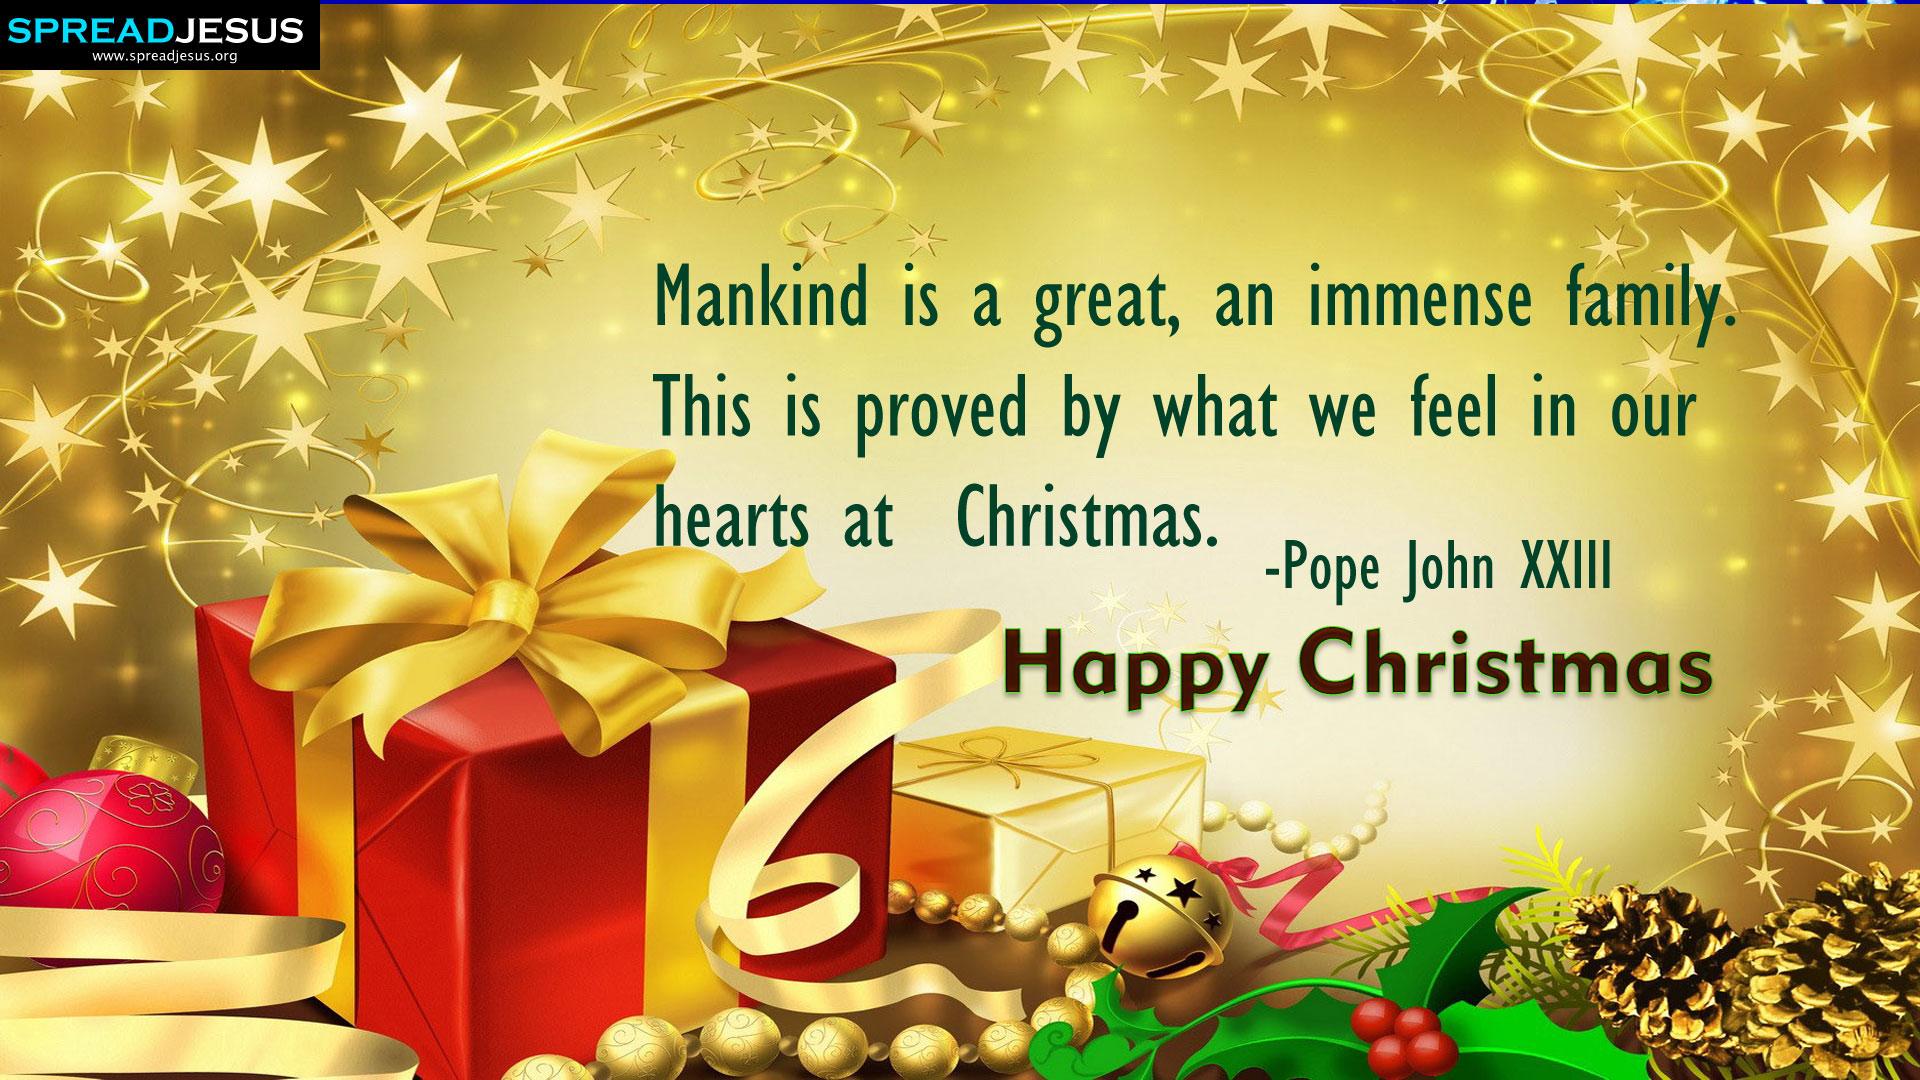 Happy Christmas:Christmas Greatings HD Wallpapers: Happy Christmas Quotes  Wallpapers Spreadjesus.org